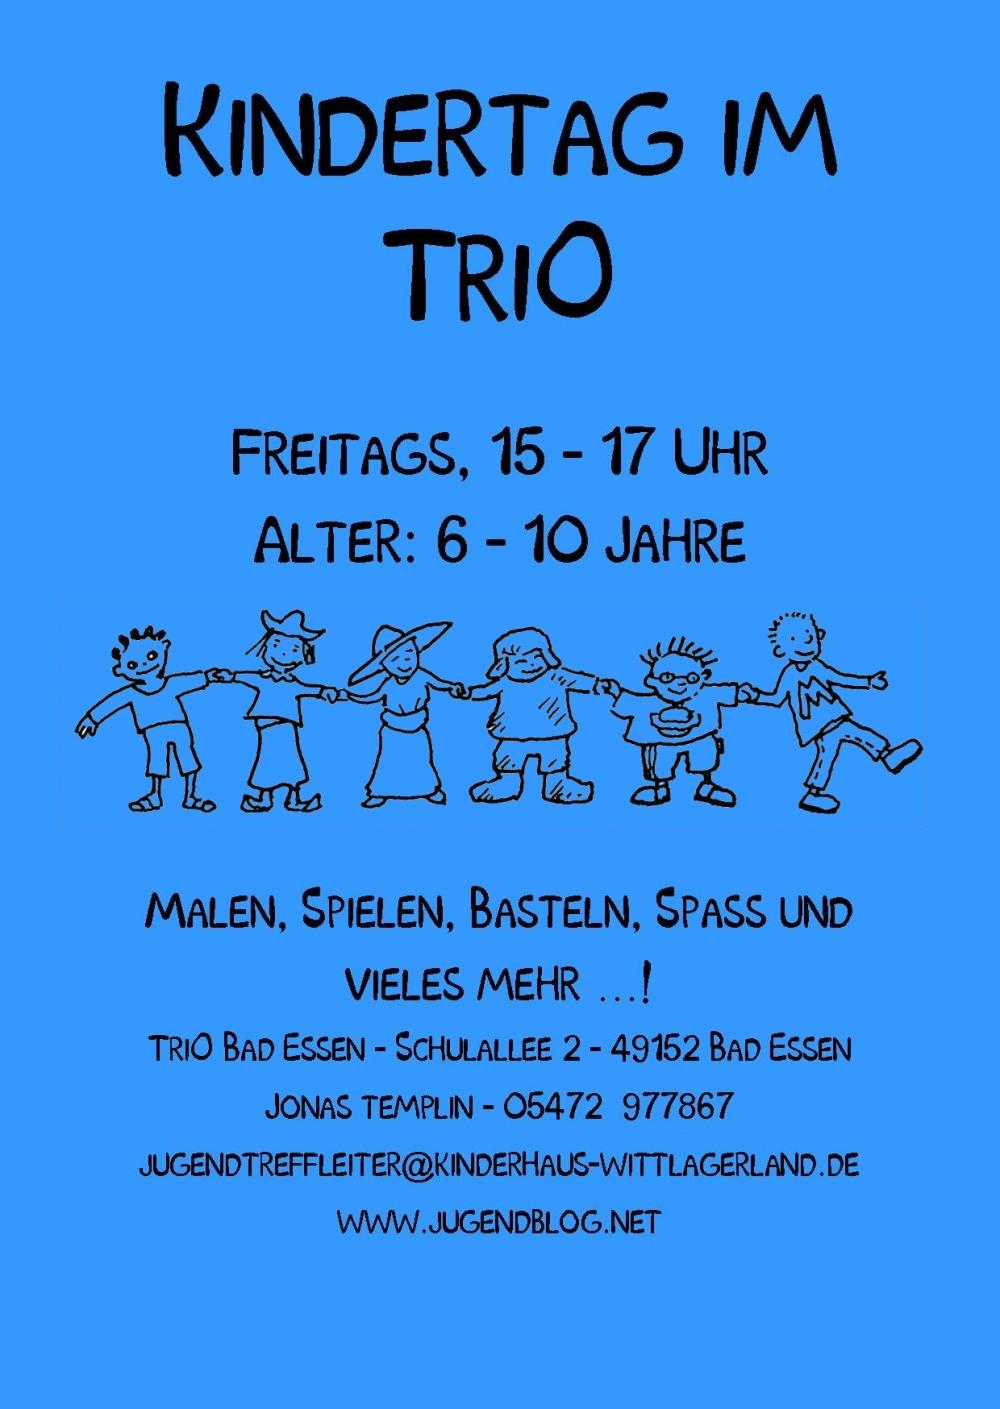 Kindertag TriO front Publisher 01.11